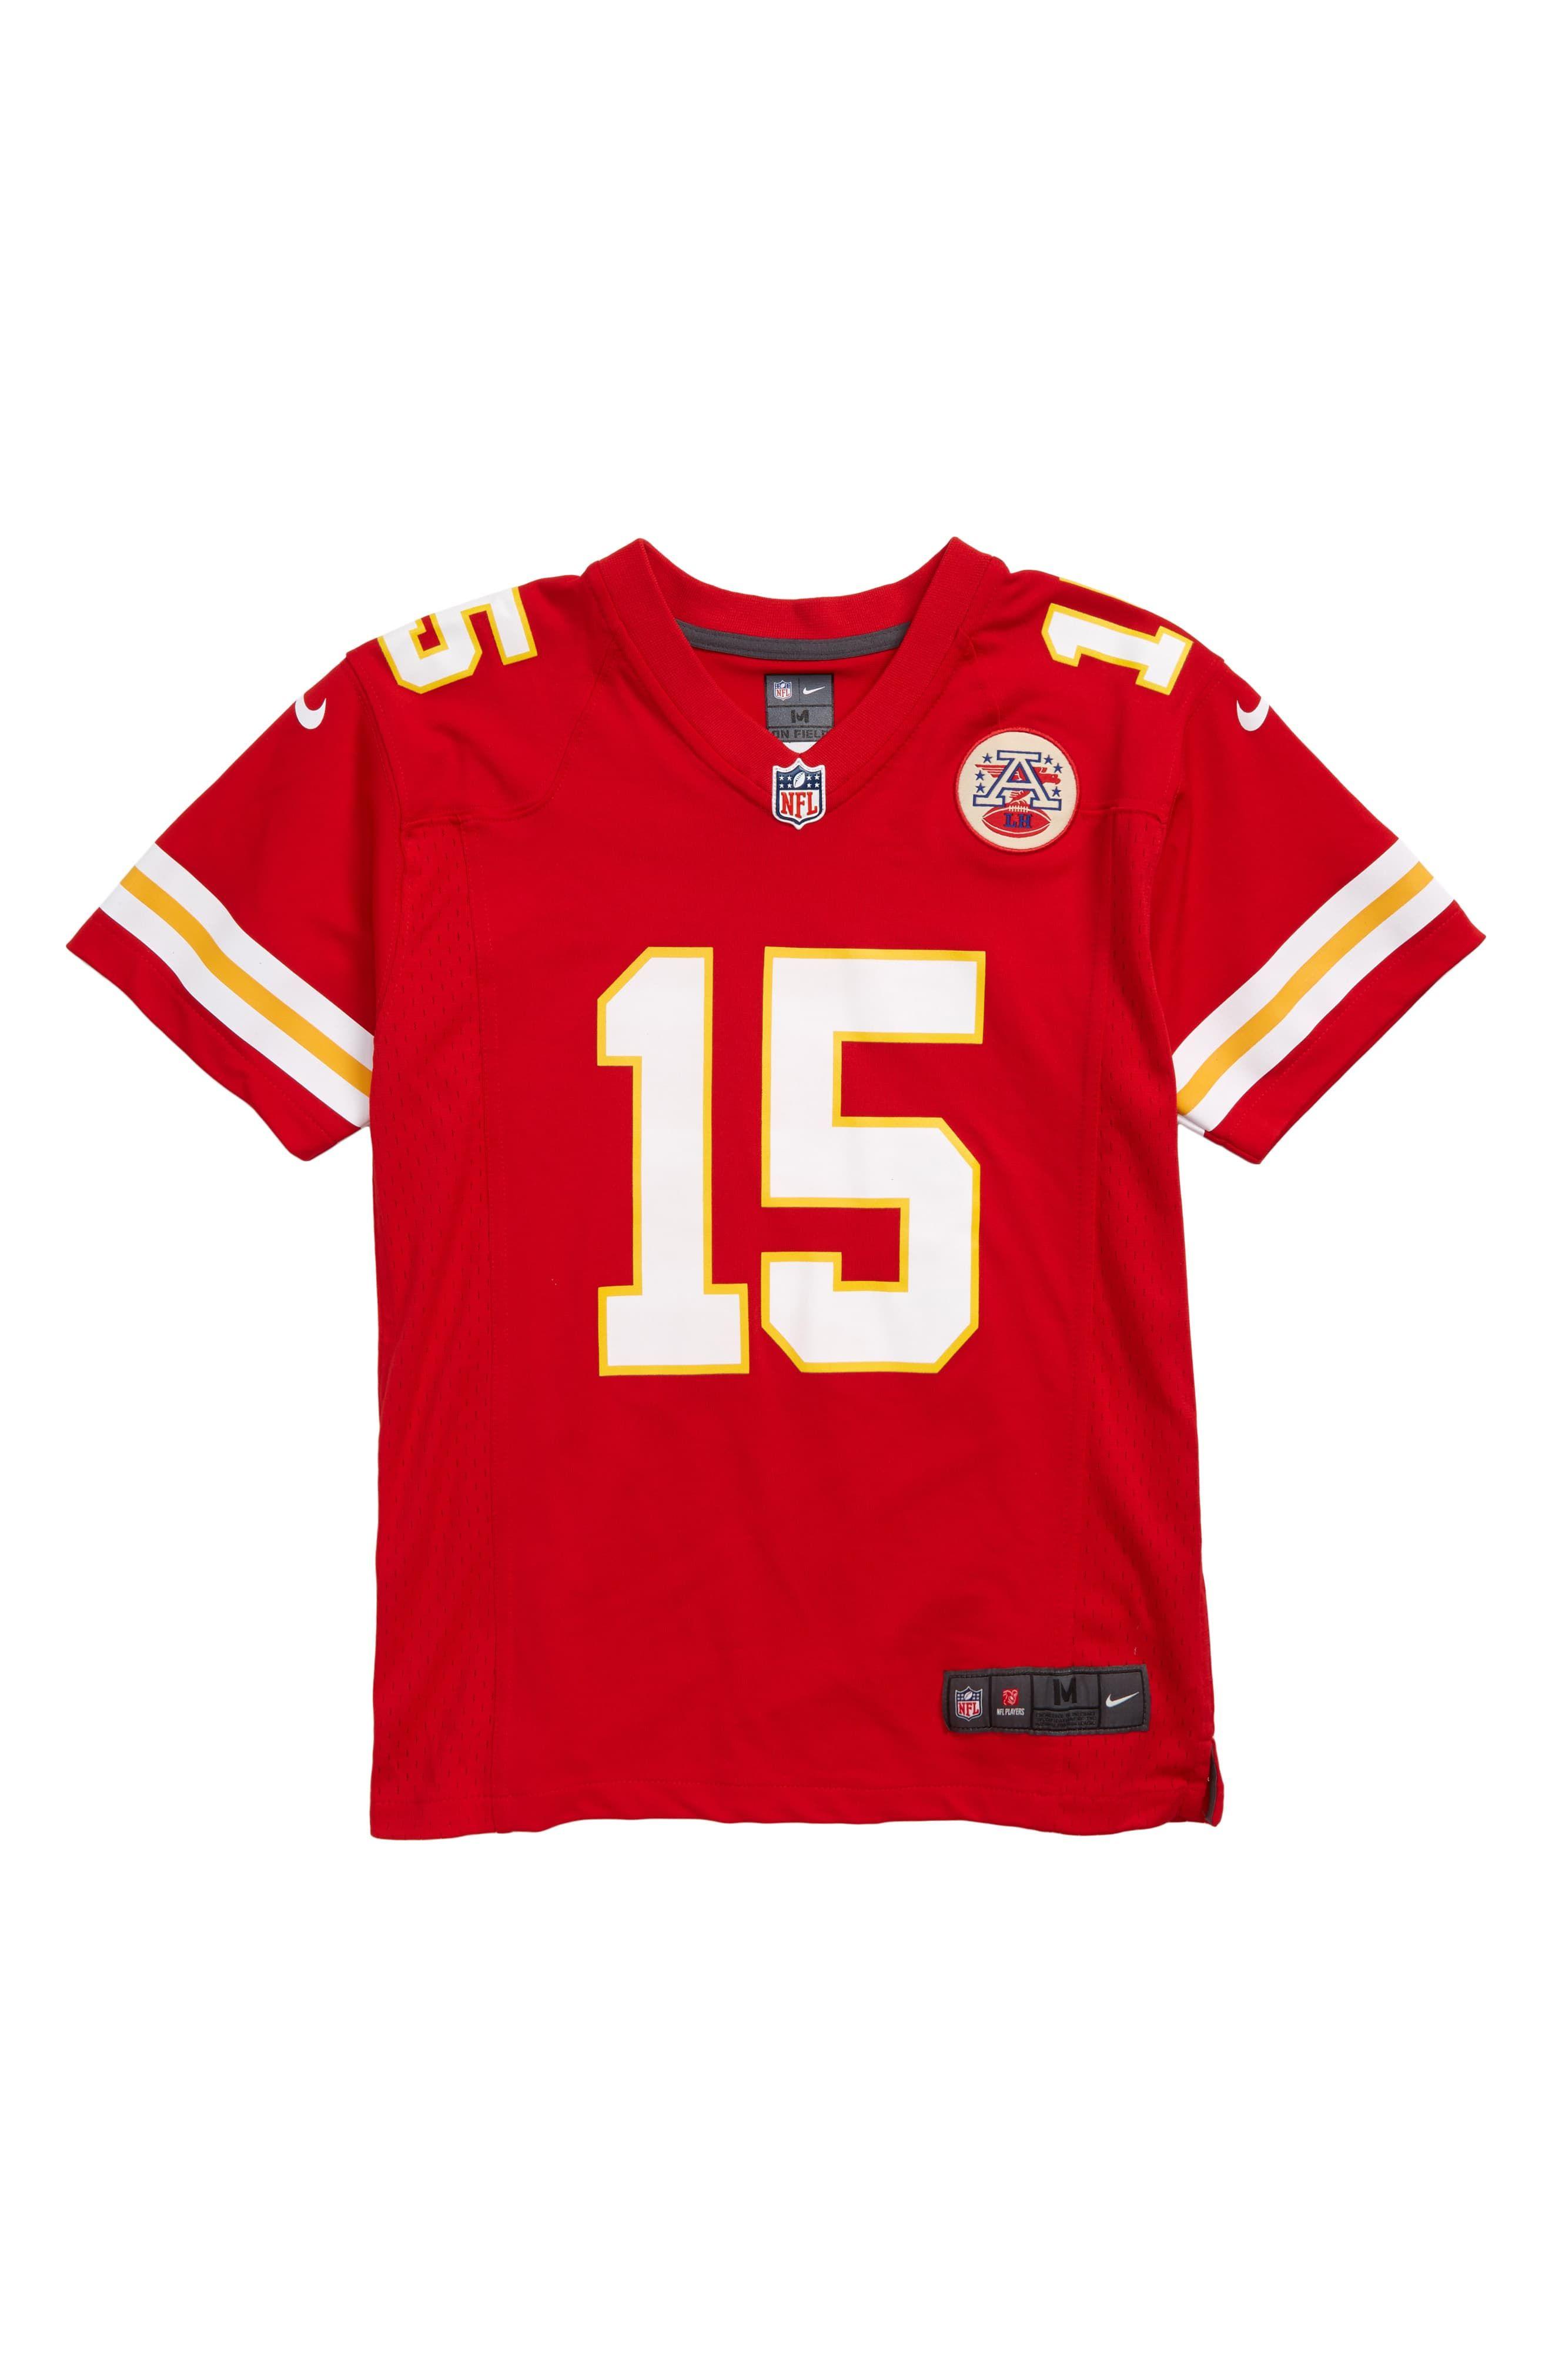 Boy's Nike Nfl Logo Kansas City Chiefs